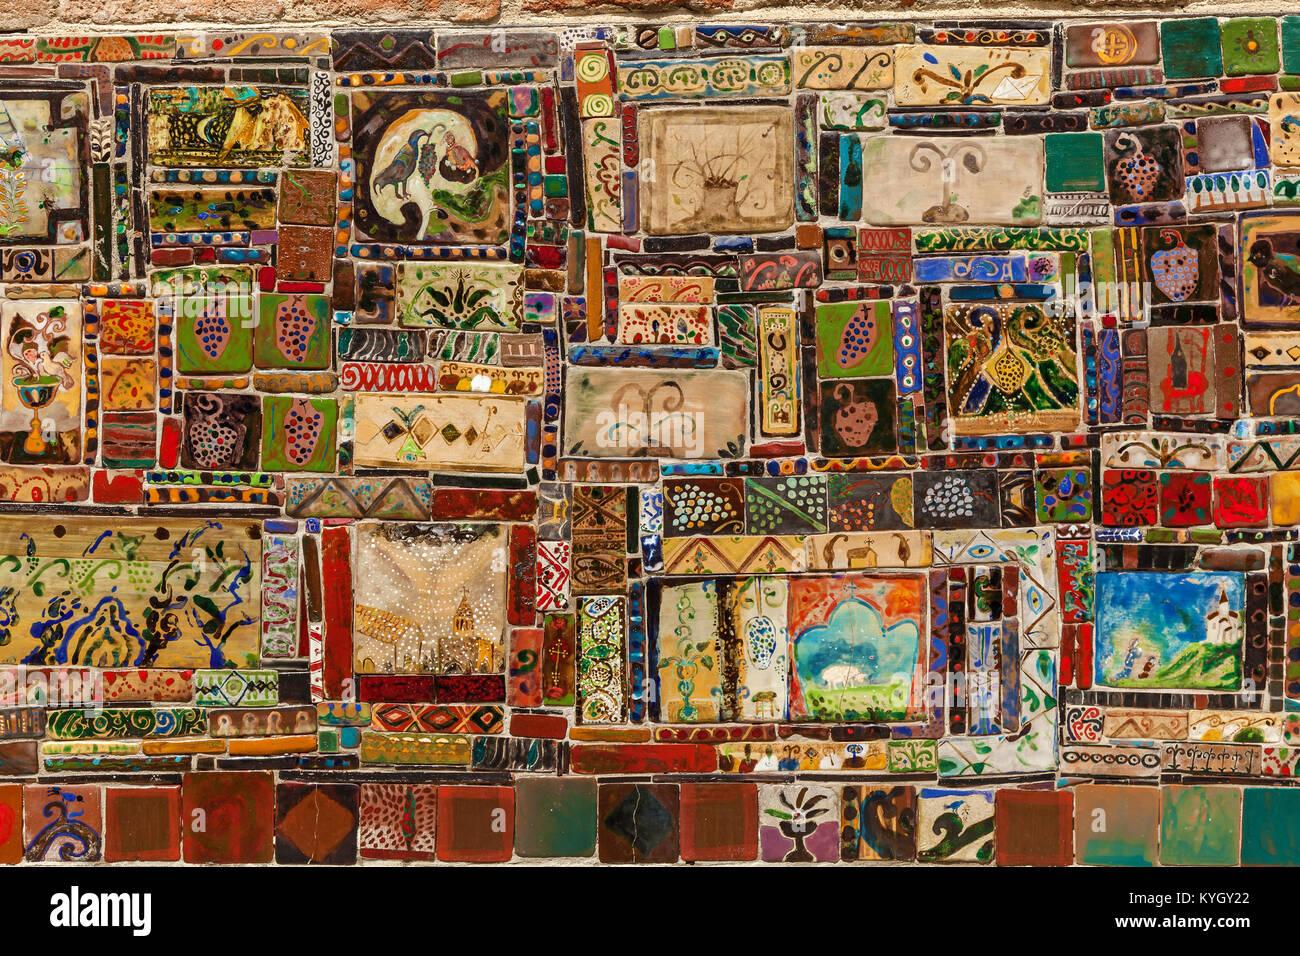 georgia mosaic photos georgia mosaic images alamy. Black Bedroom Furniture Sets. Home Design Ideas